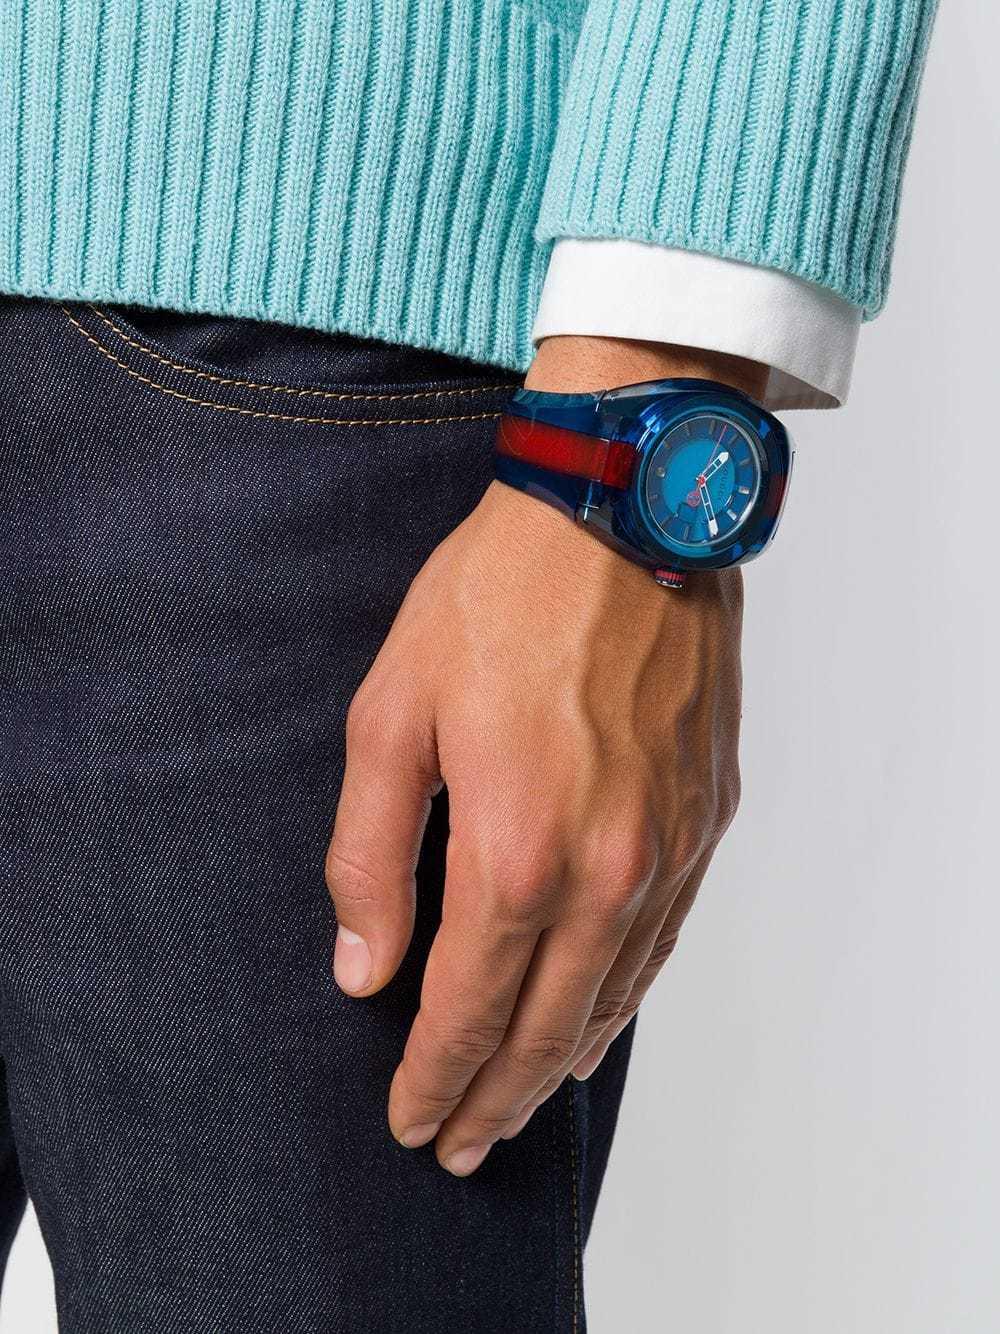 04492d7eb5d Gucci Gg Web Sync Watch